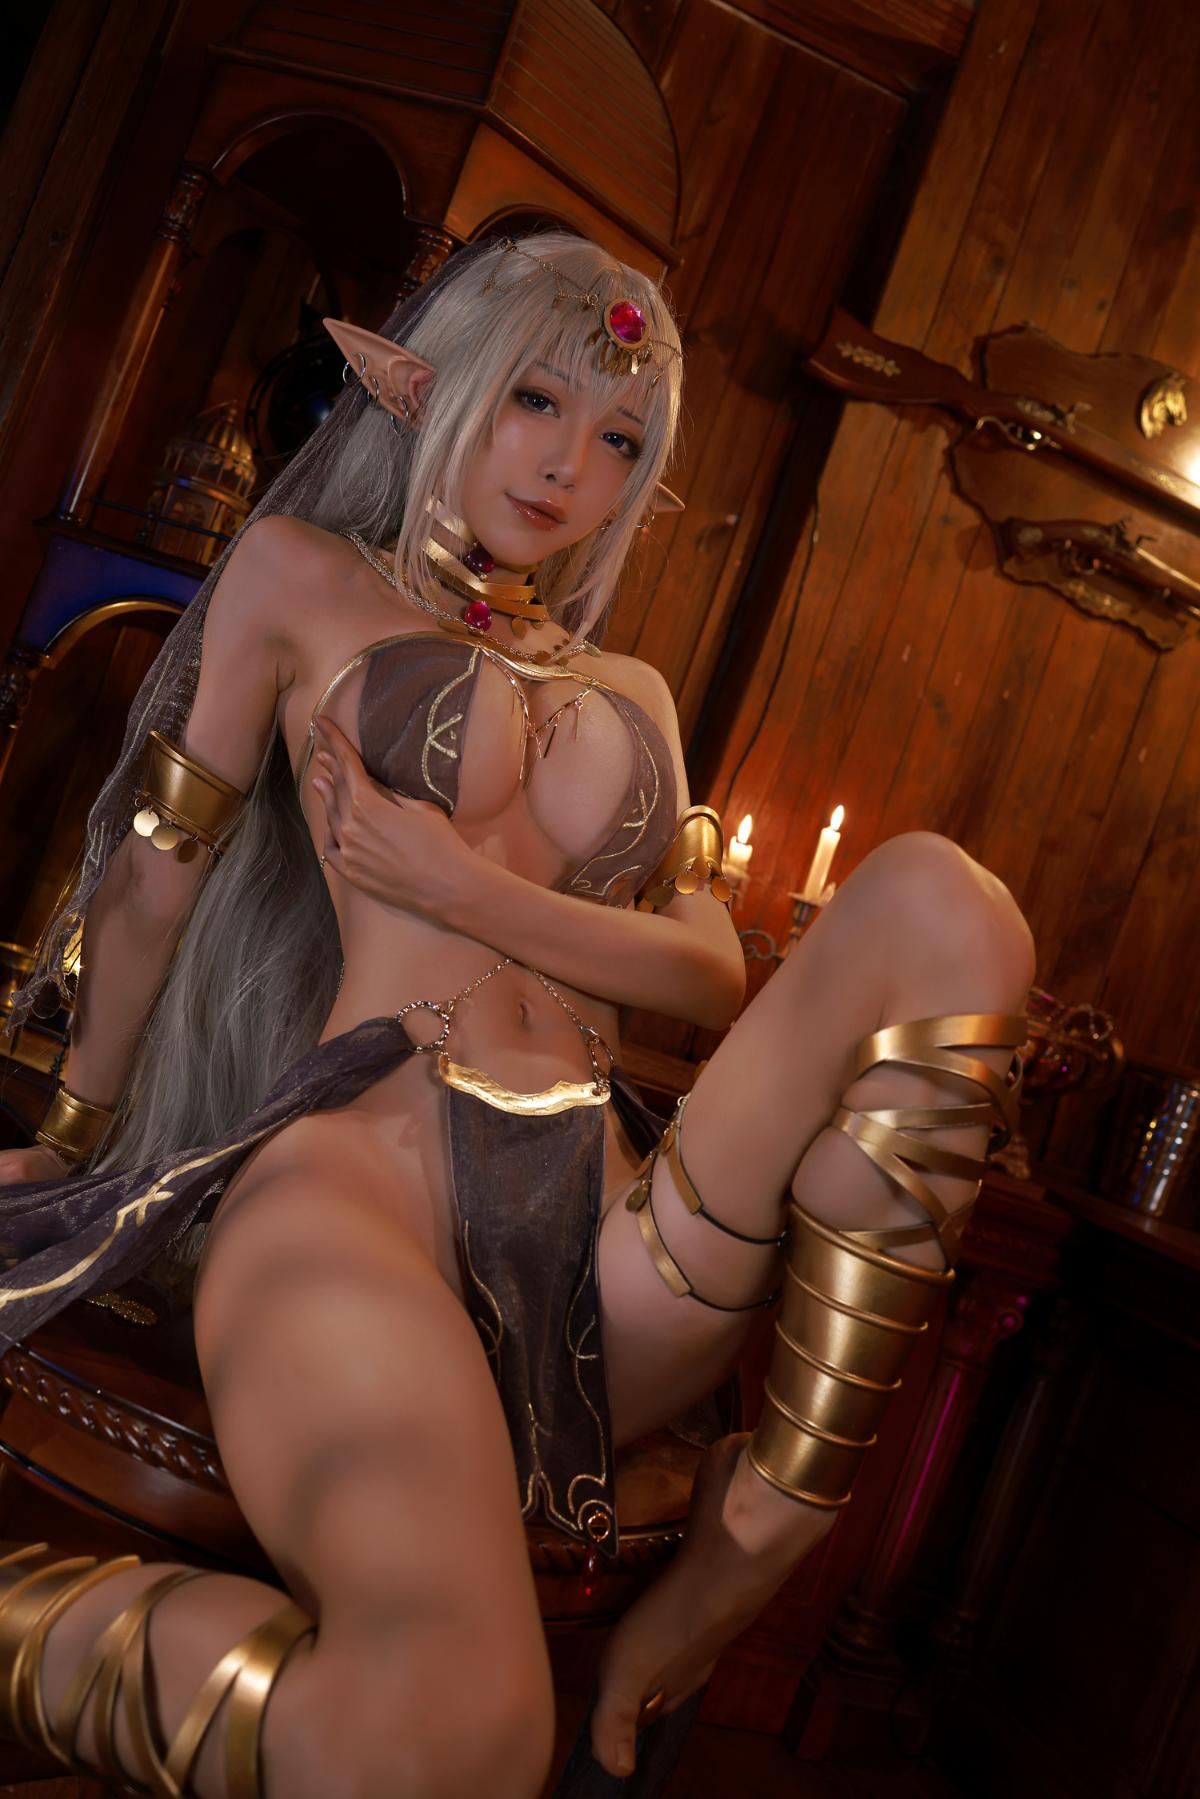 Tan Dancer Elf Succubus Cosplay by Aqua 15